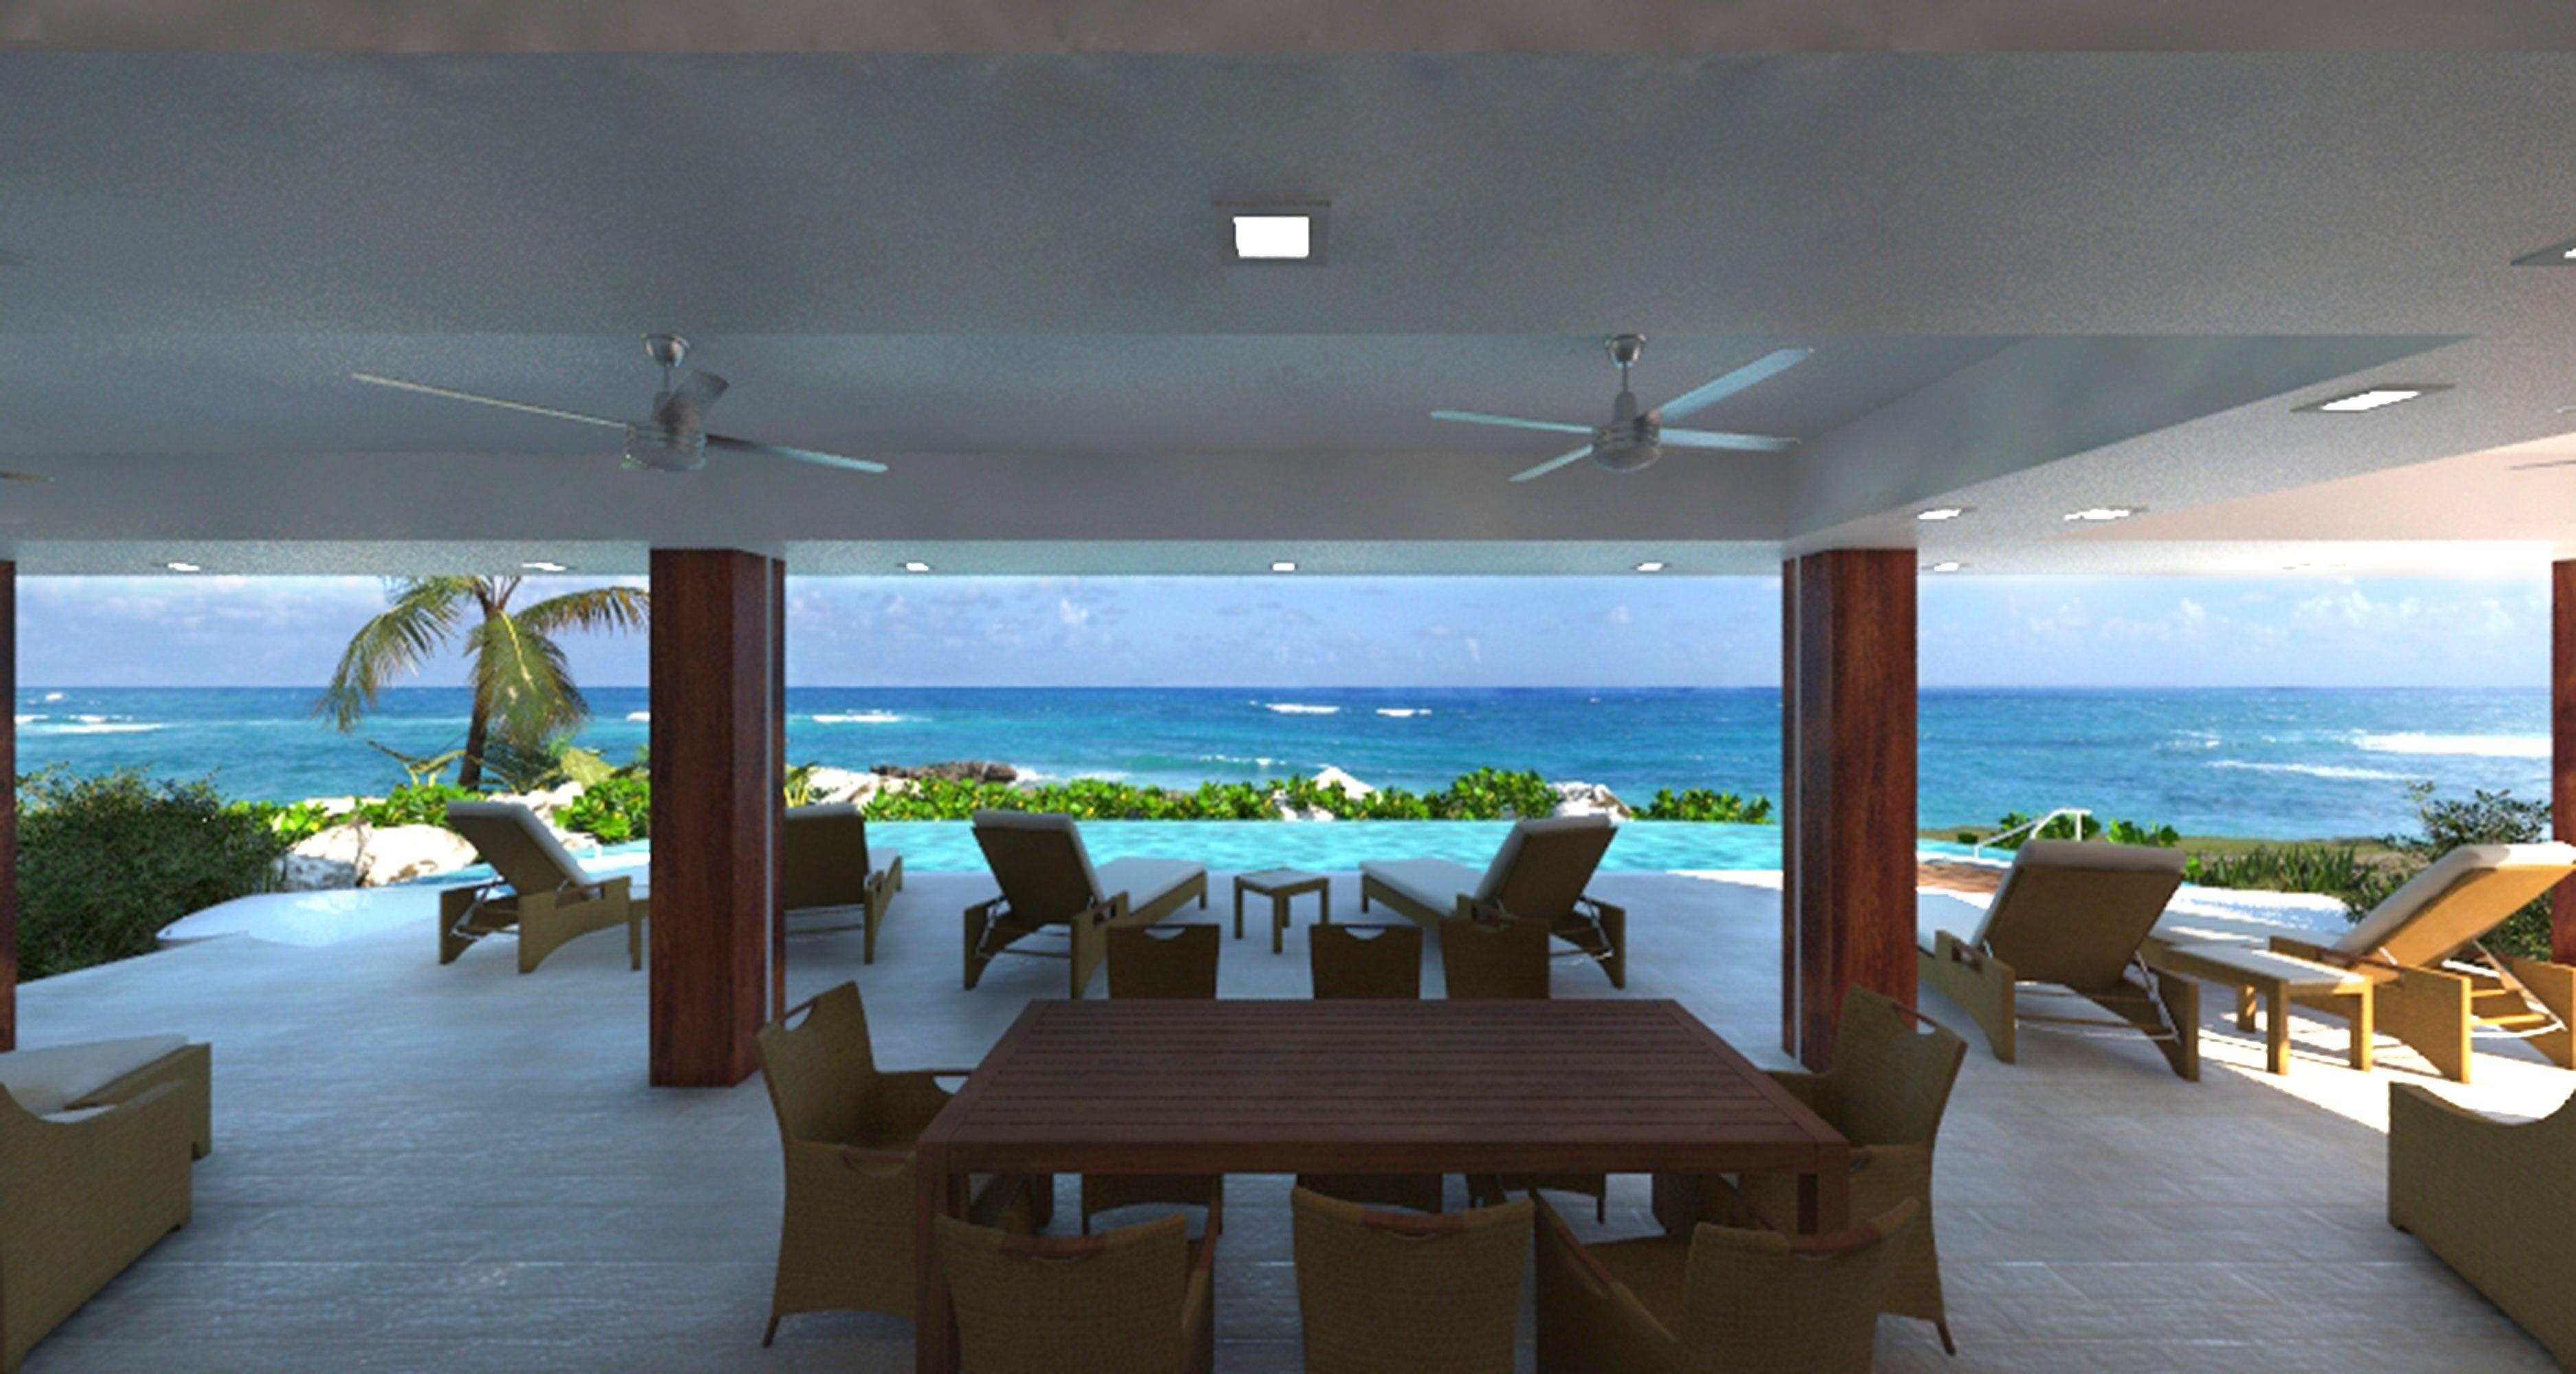 180 Degree Panoramic Ocean Views In The New Open Plan Beach House Concept Beach Houses Ocean Home Decor Cool House Designs Open Concept Home